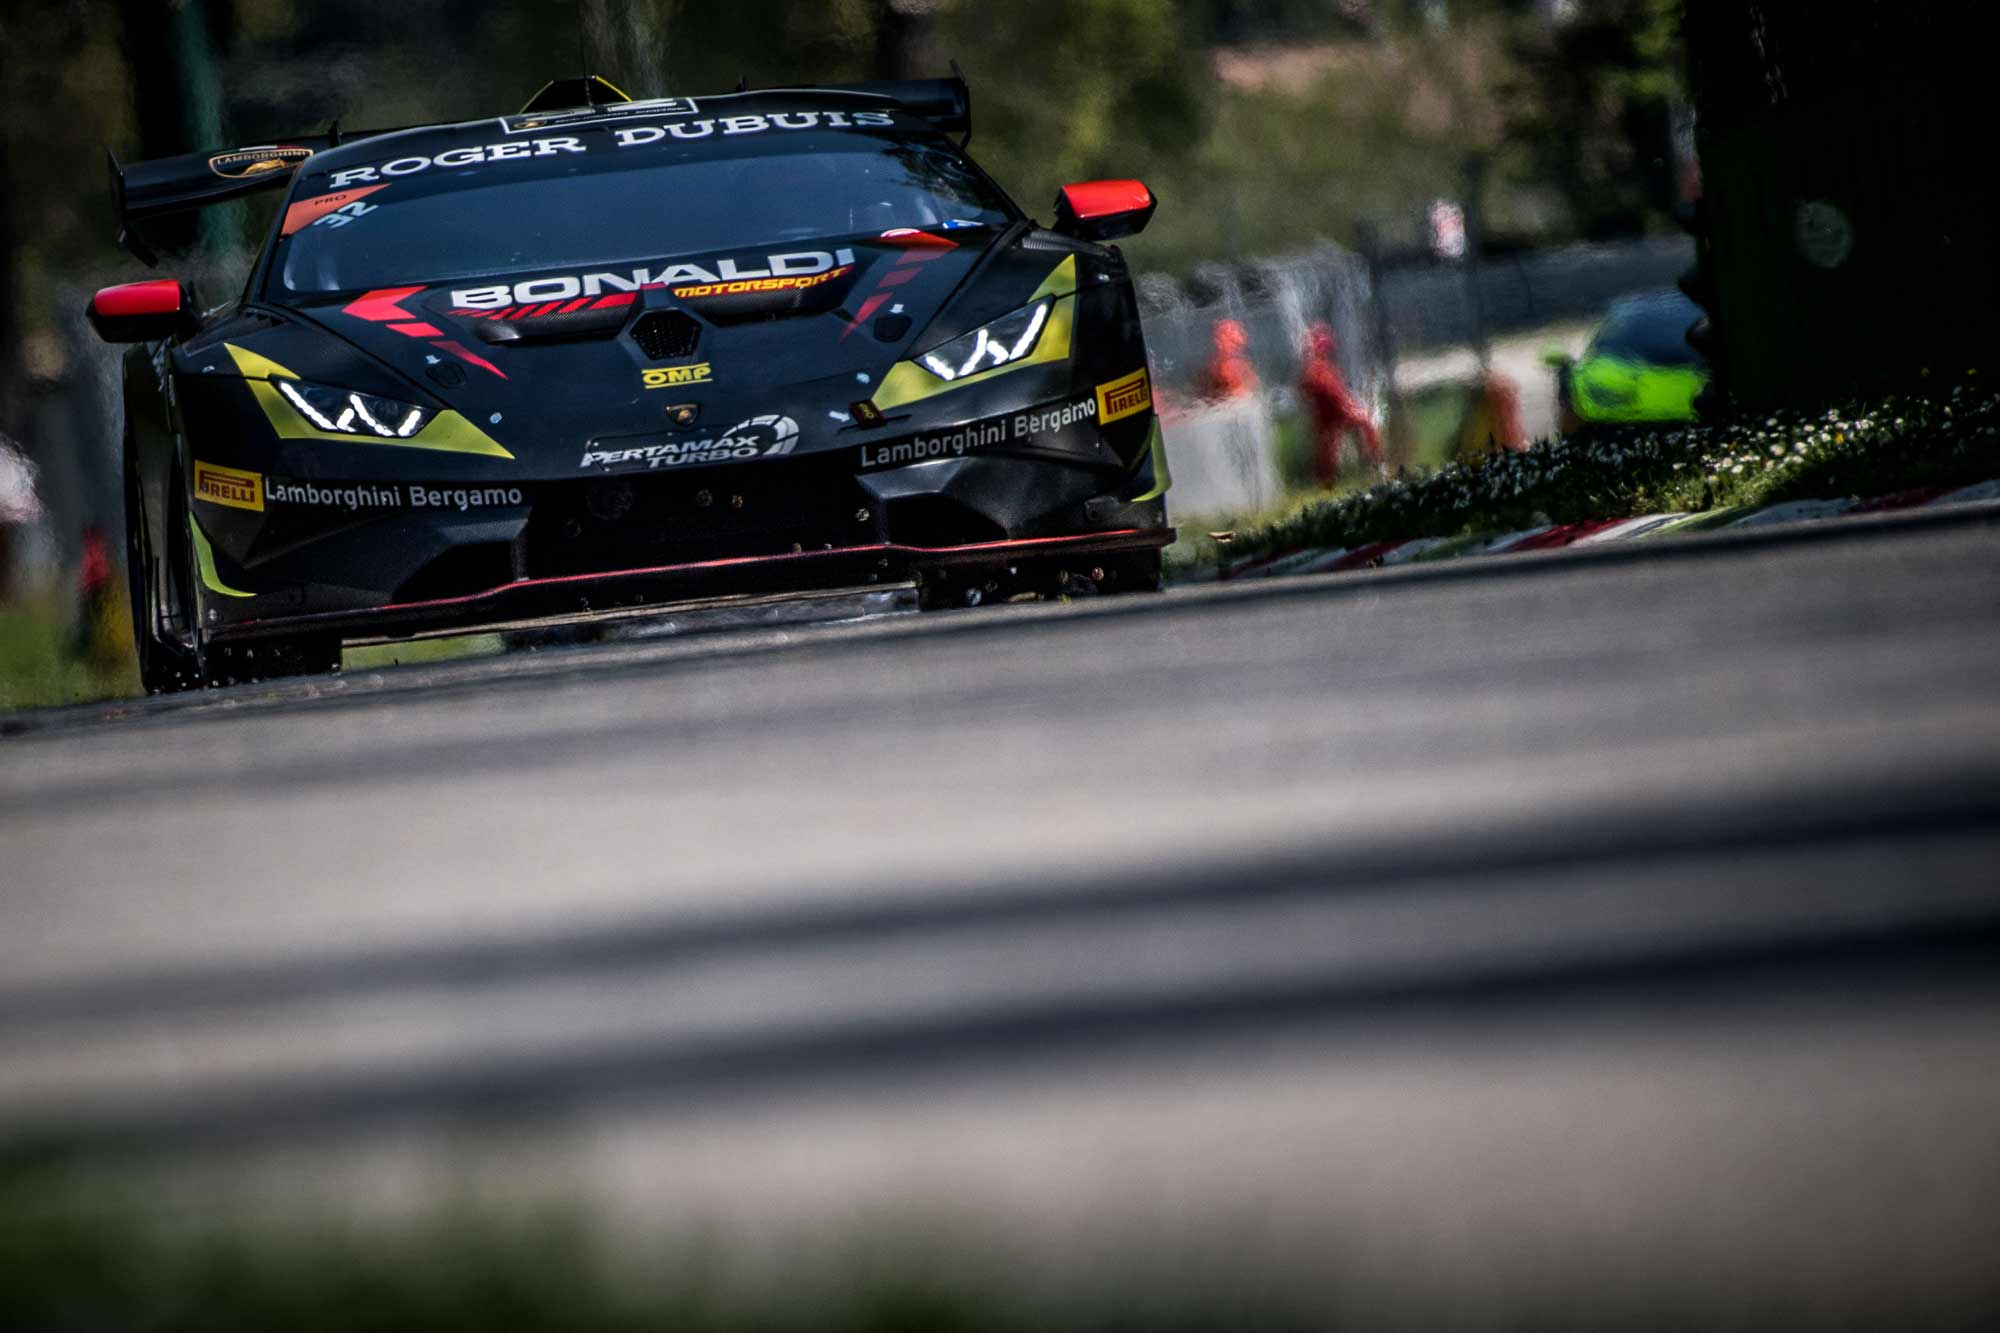 2018 - Lamborghini Super Trofeo